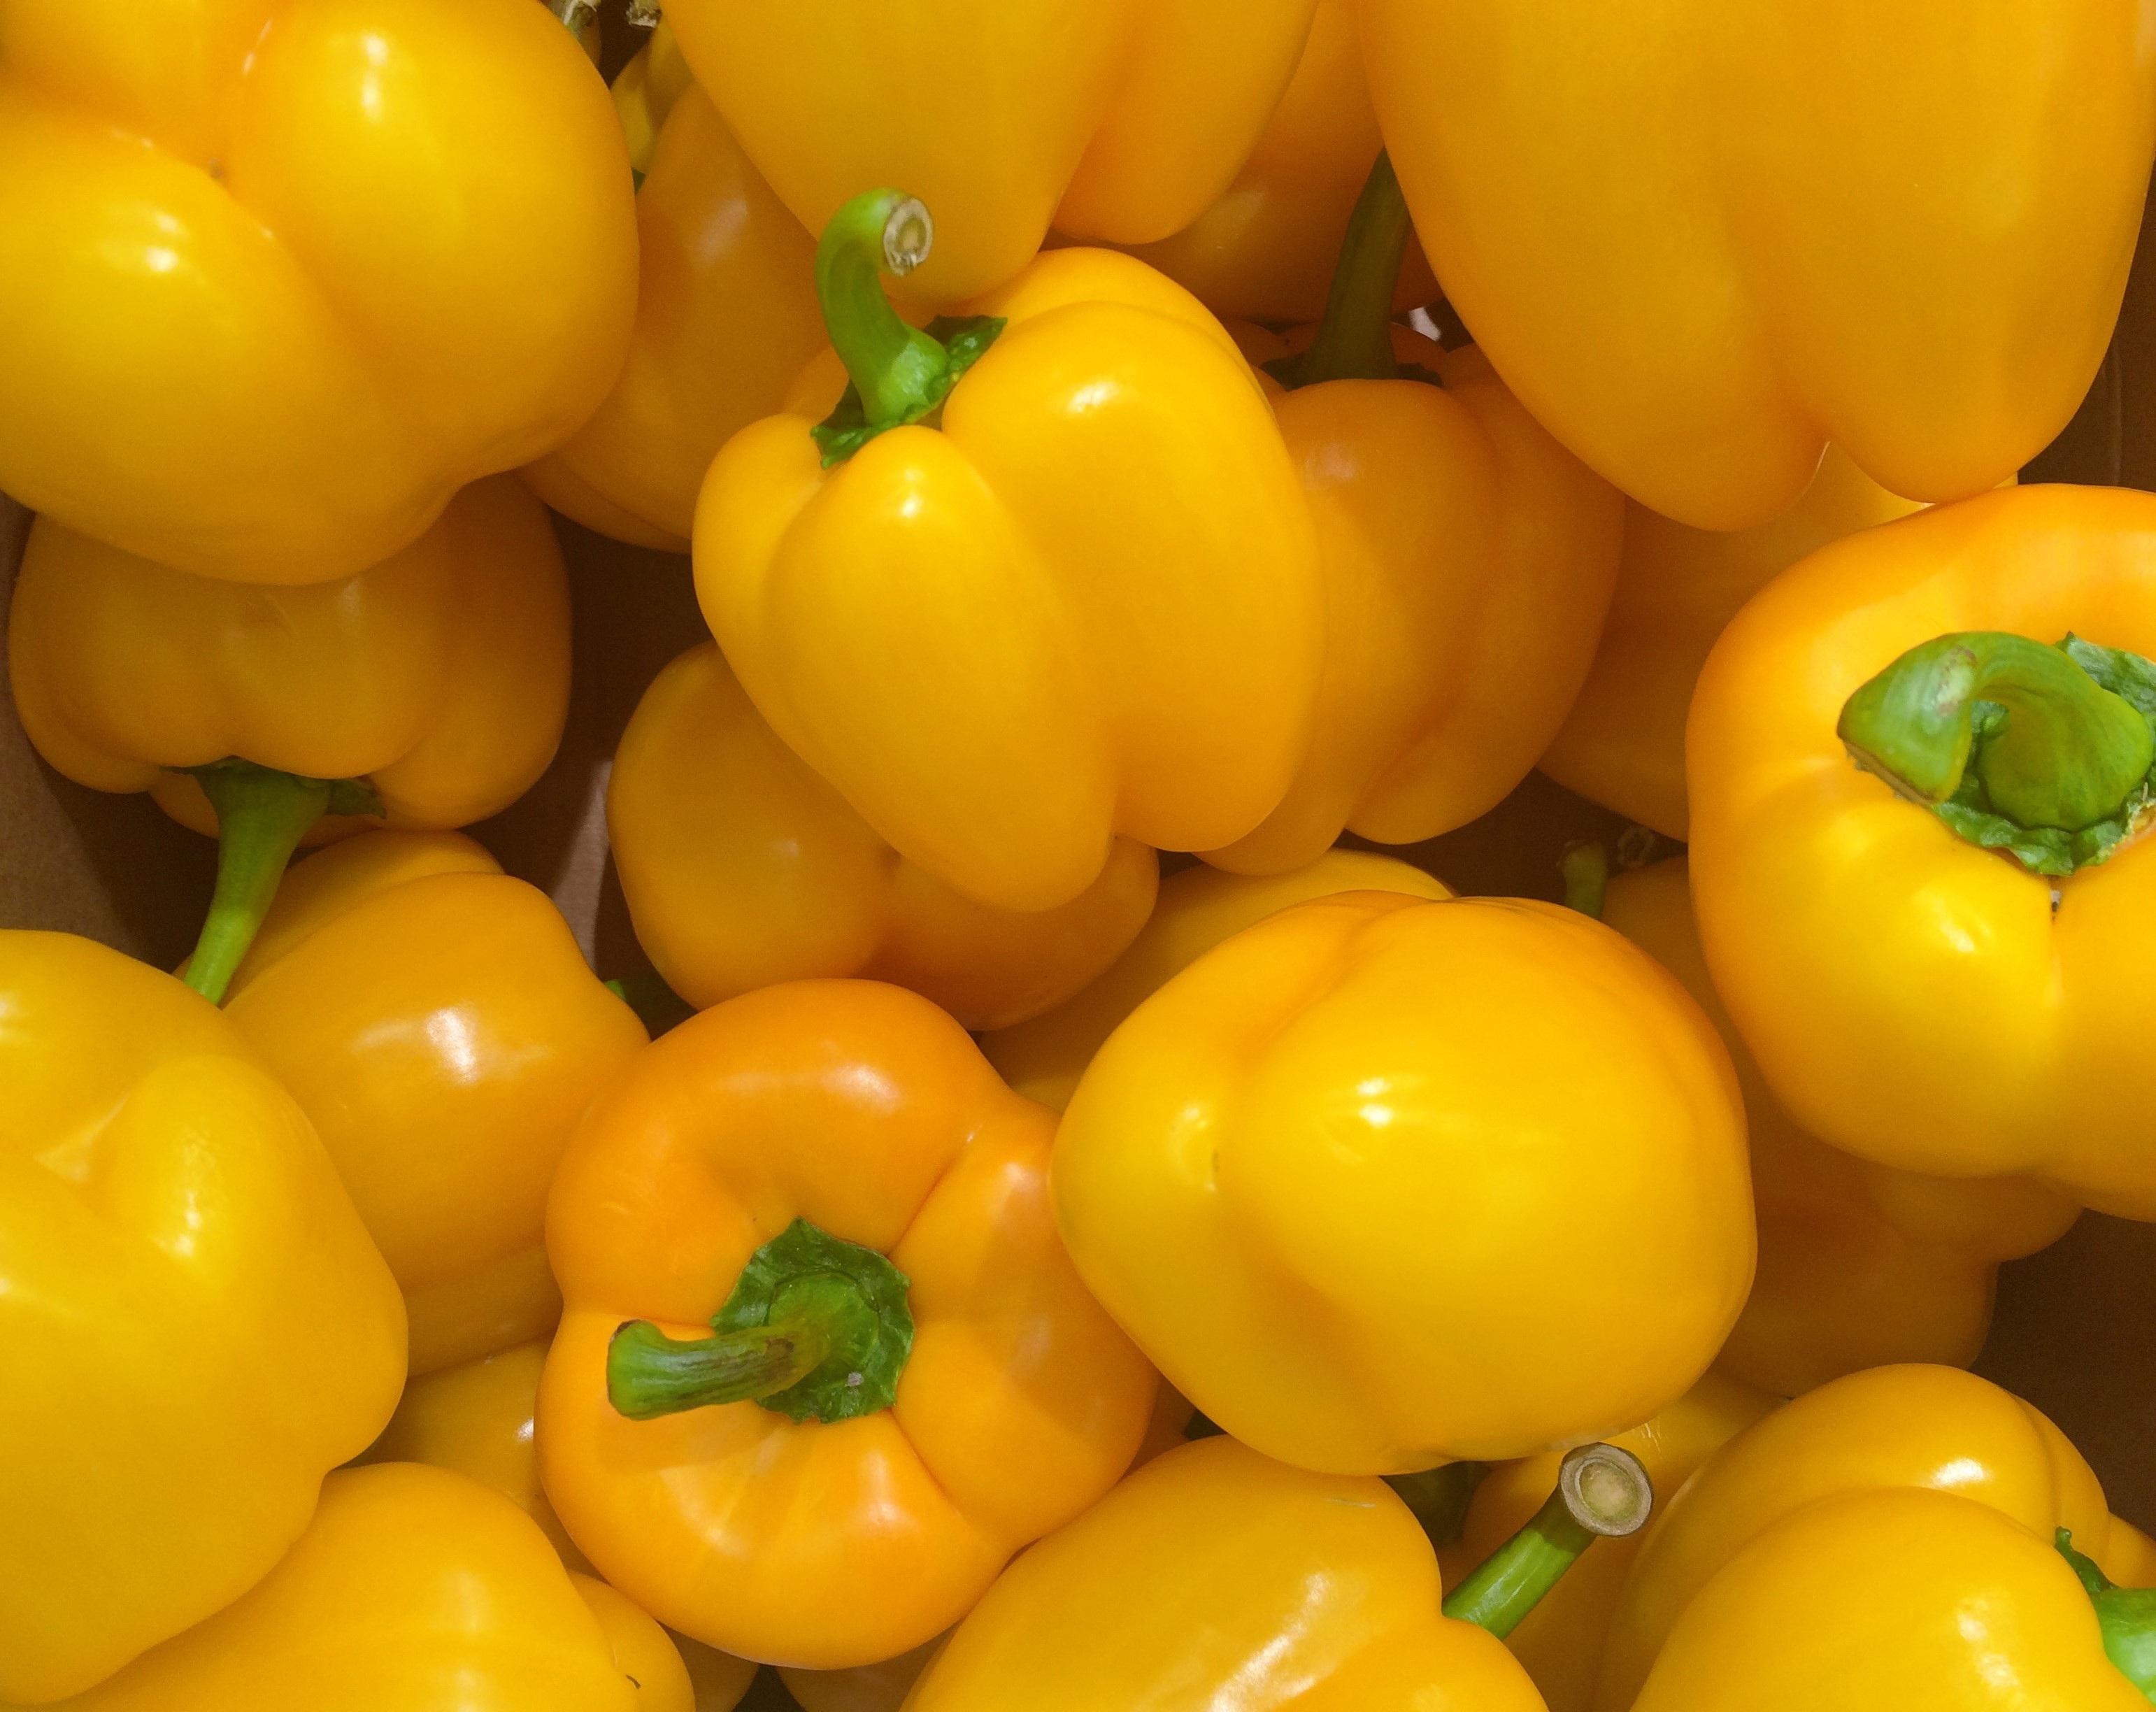 free images fruit flower food produce vegetable japan